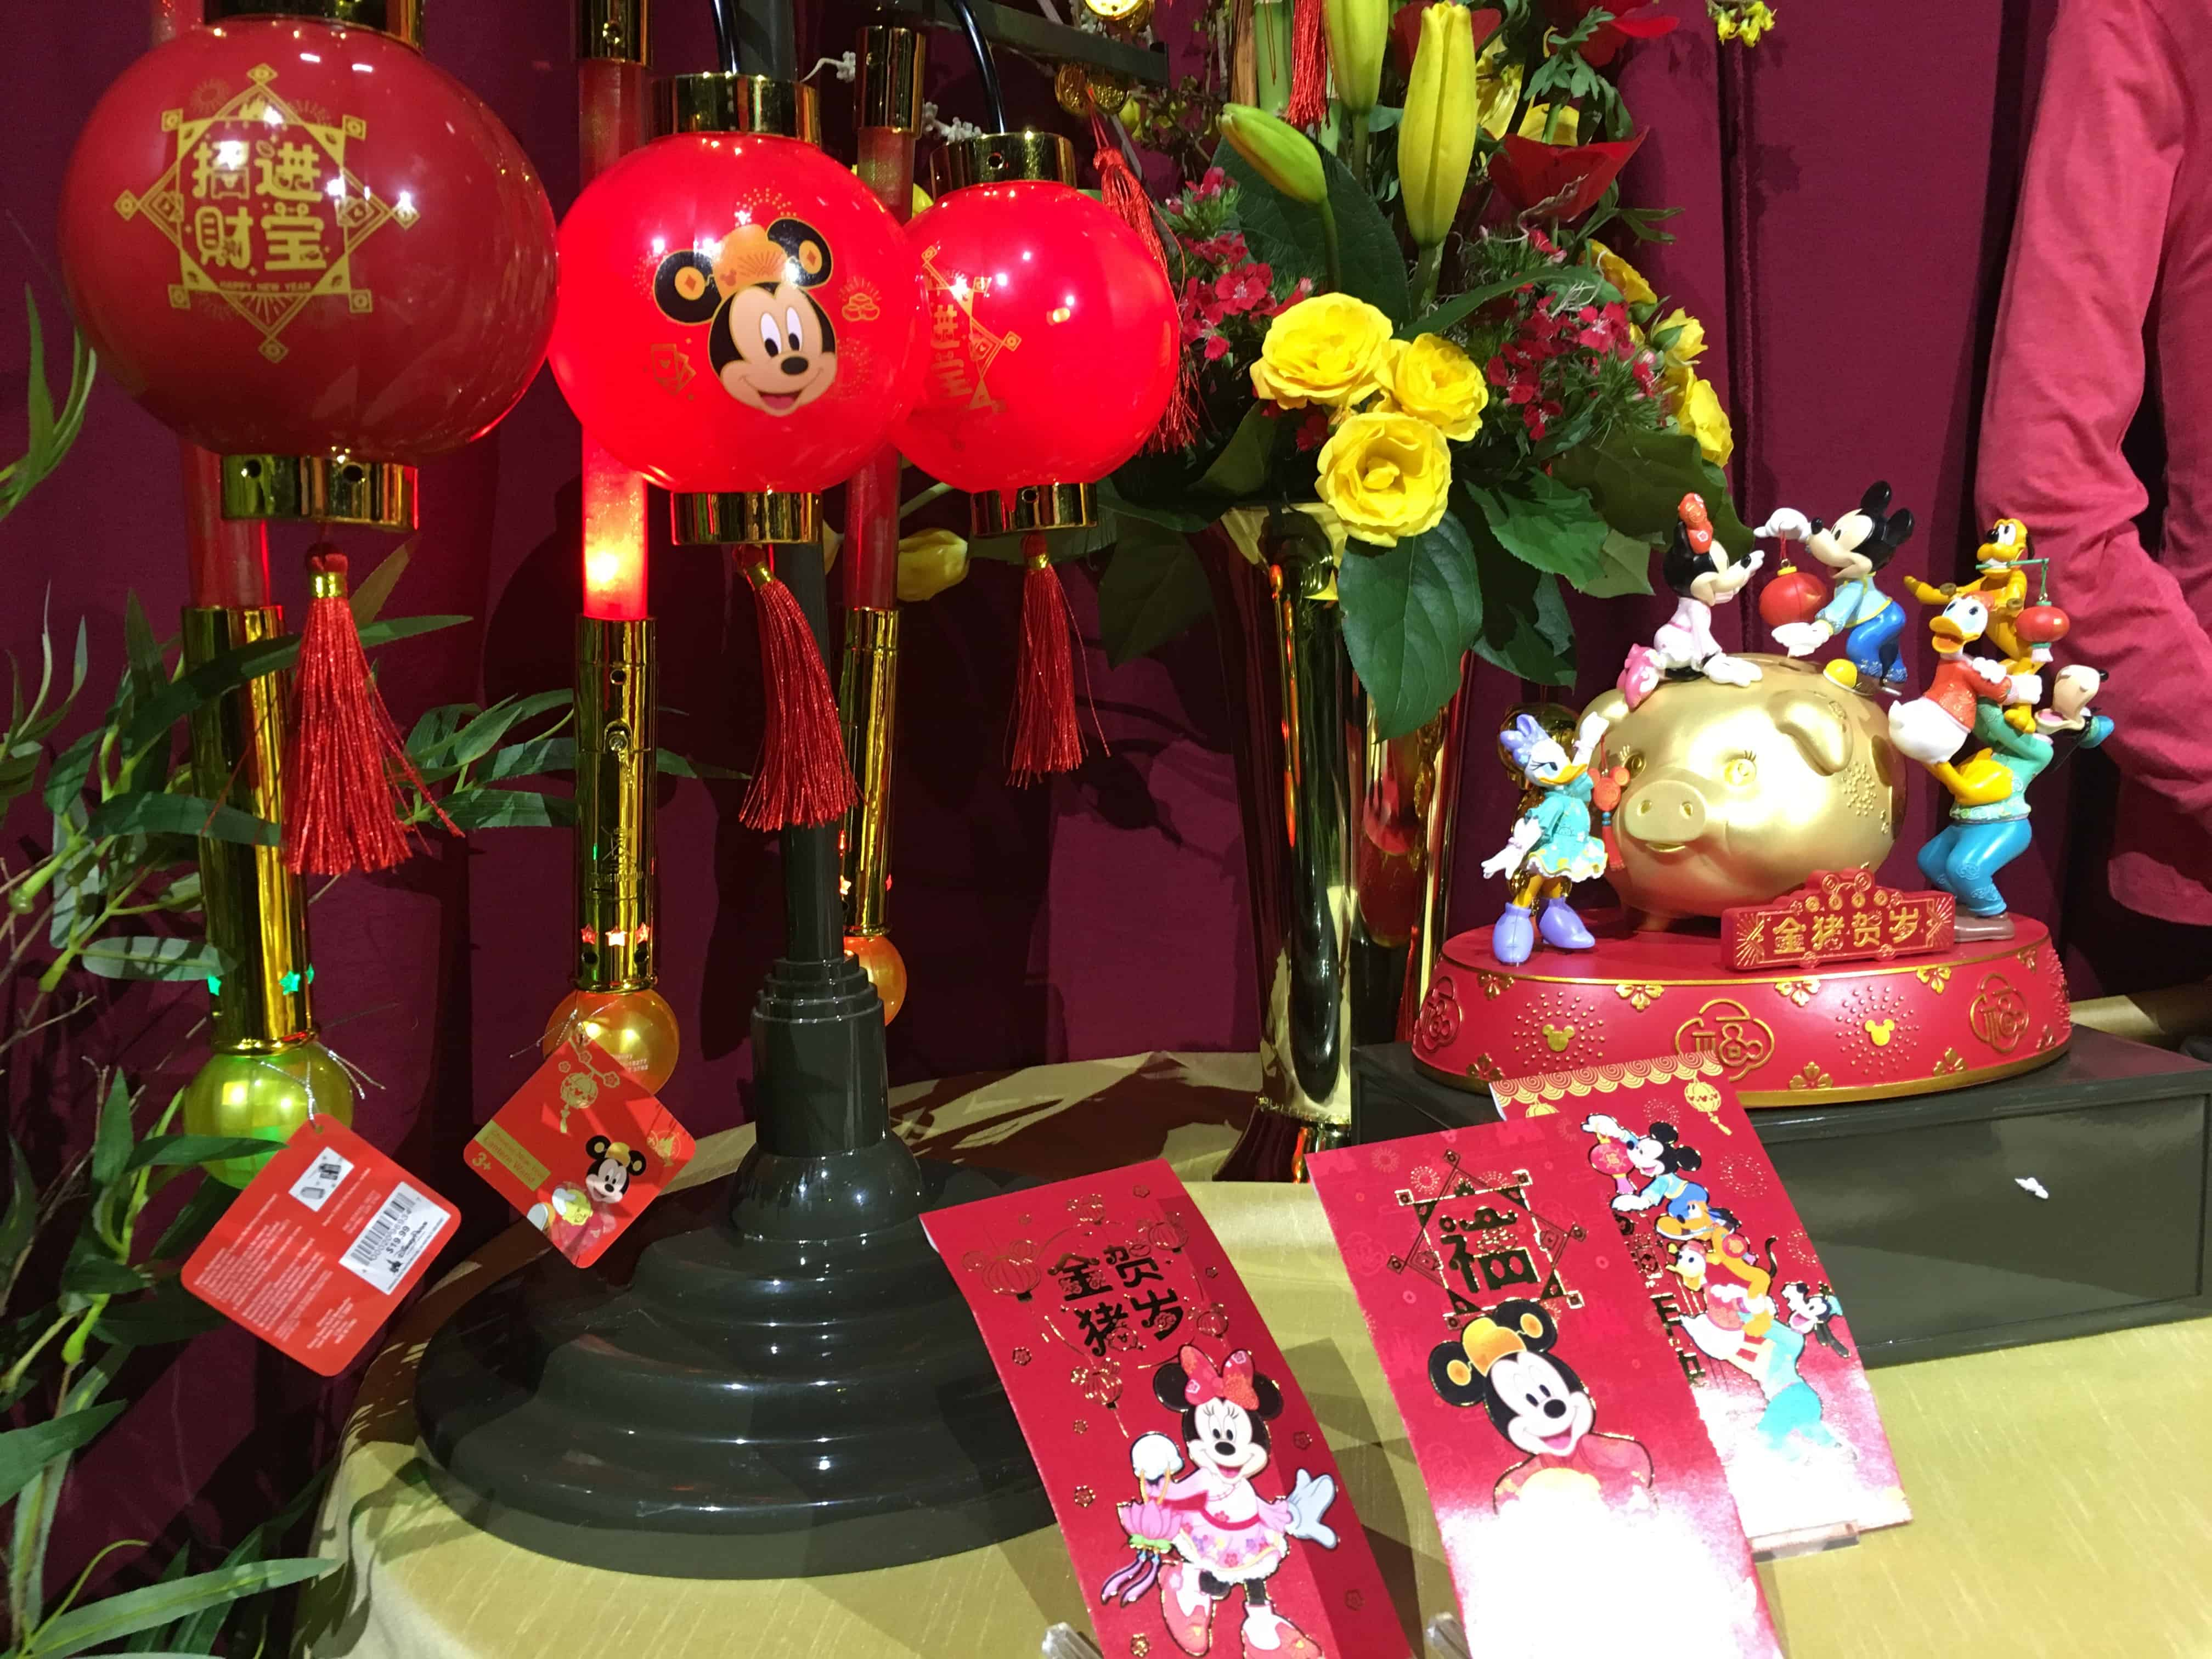 Lunar New Year light up lantern